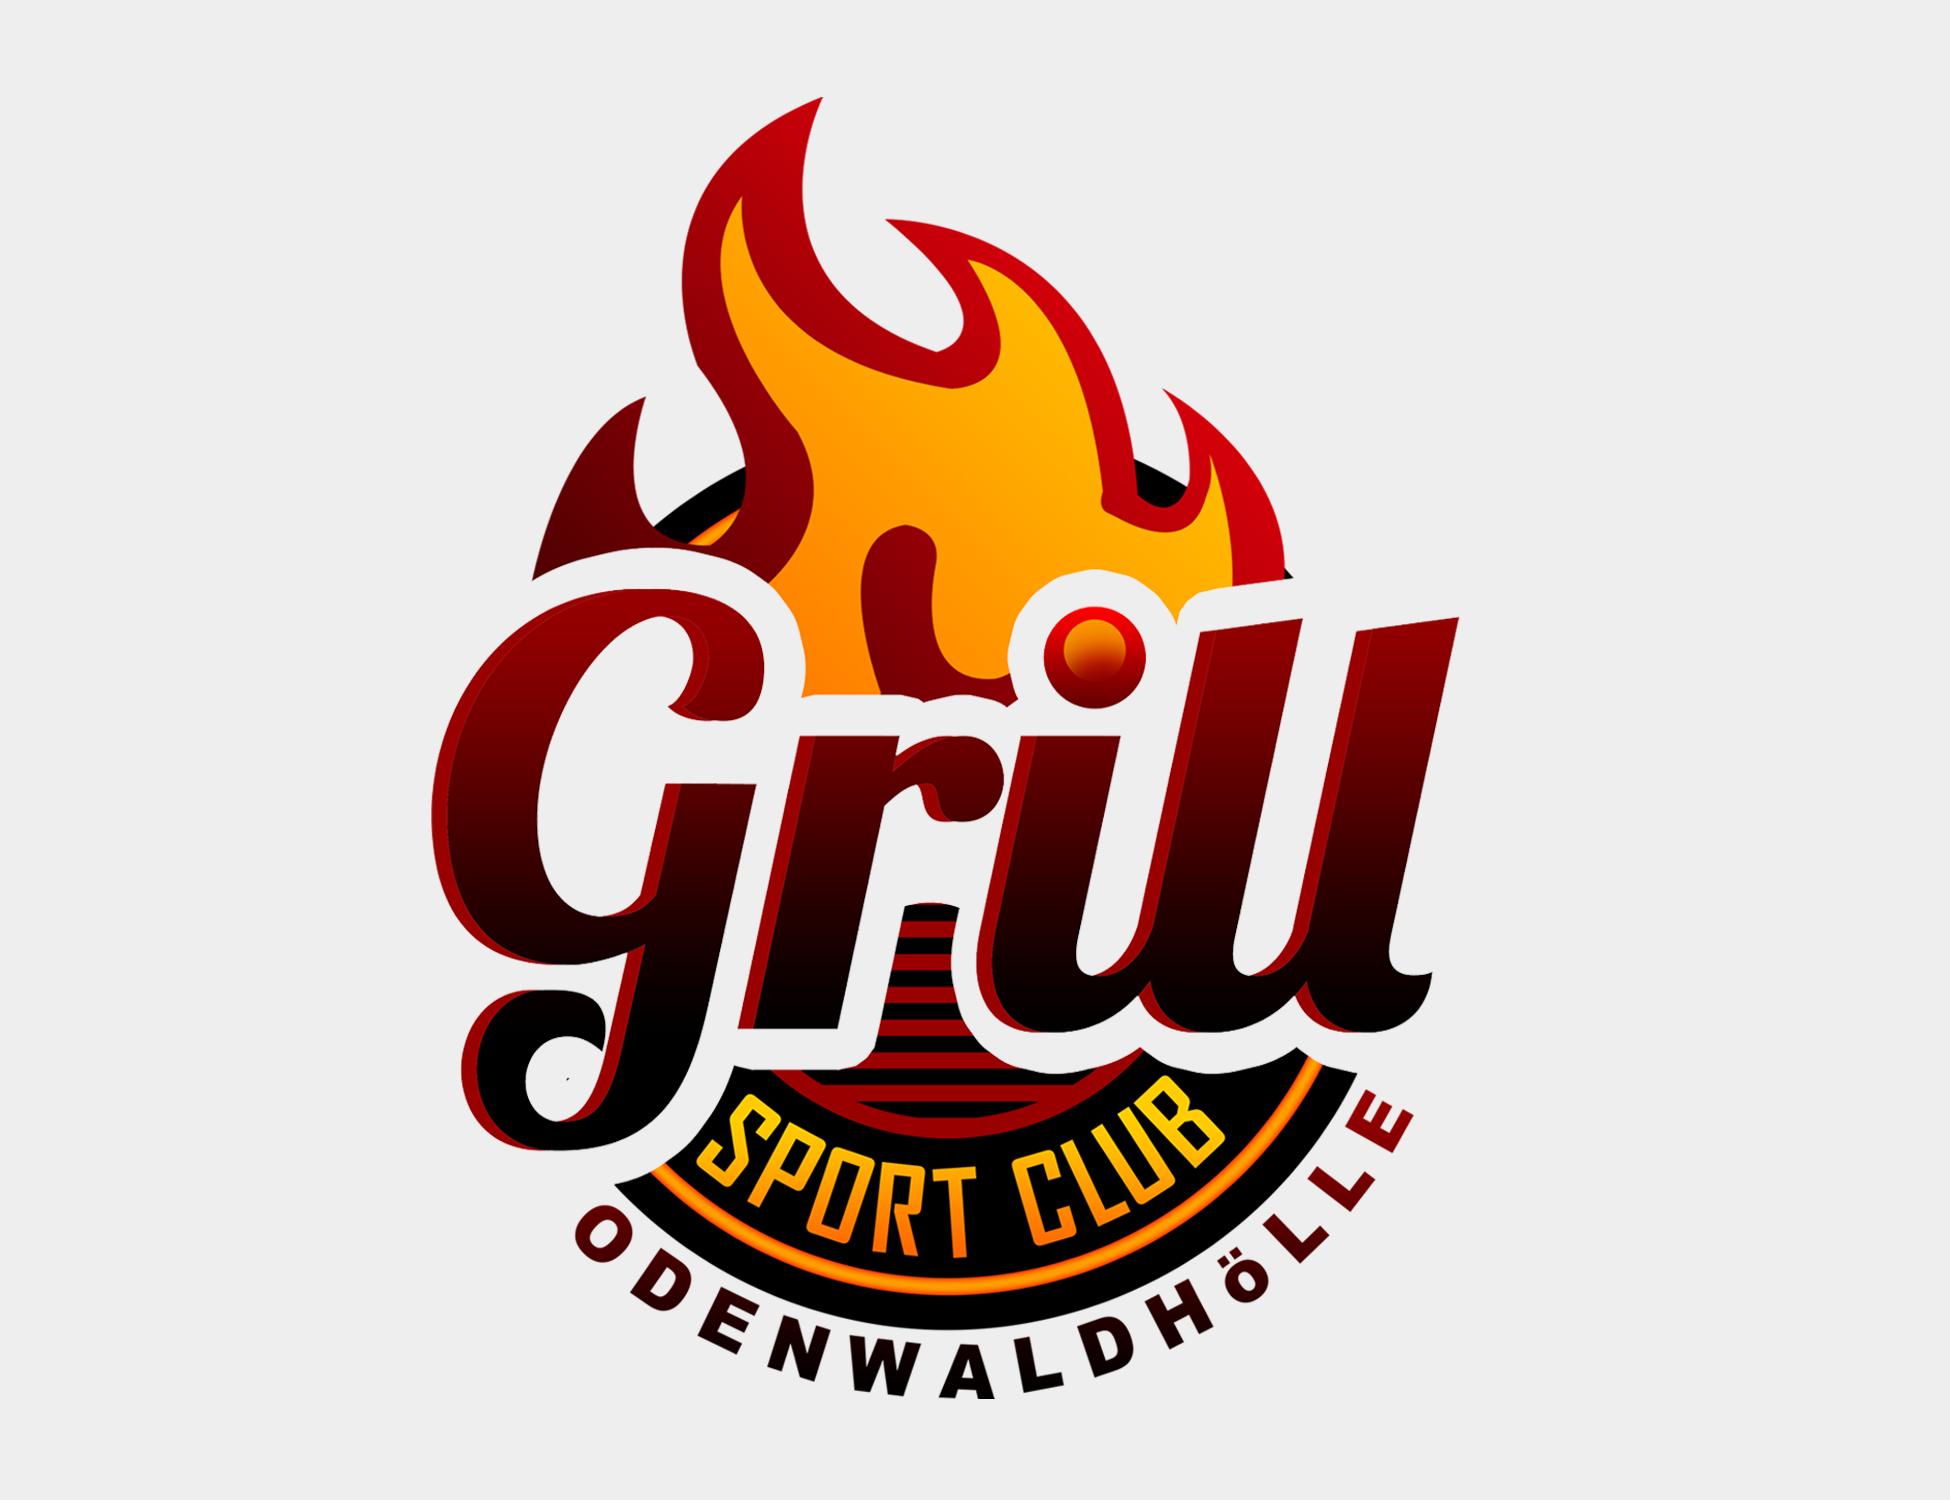 GrillSportClub